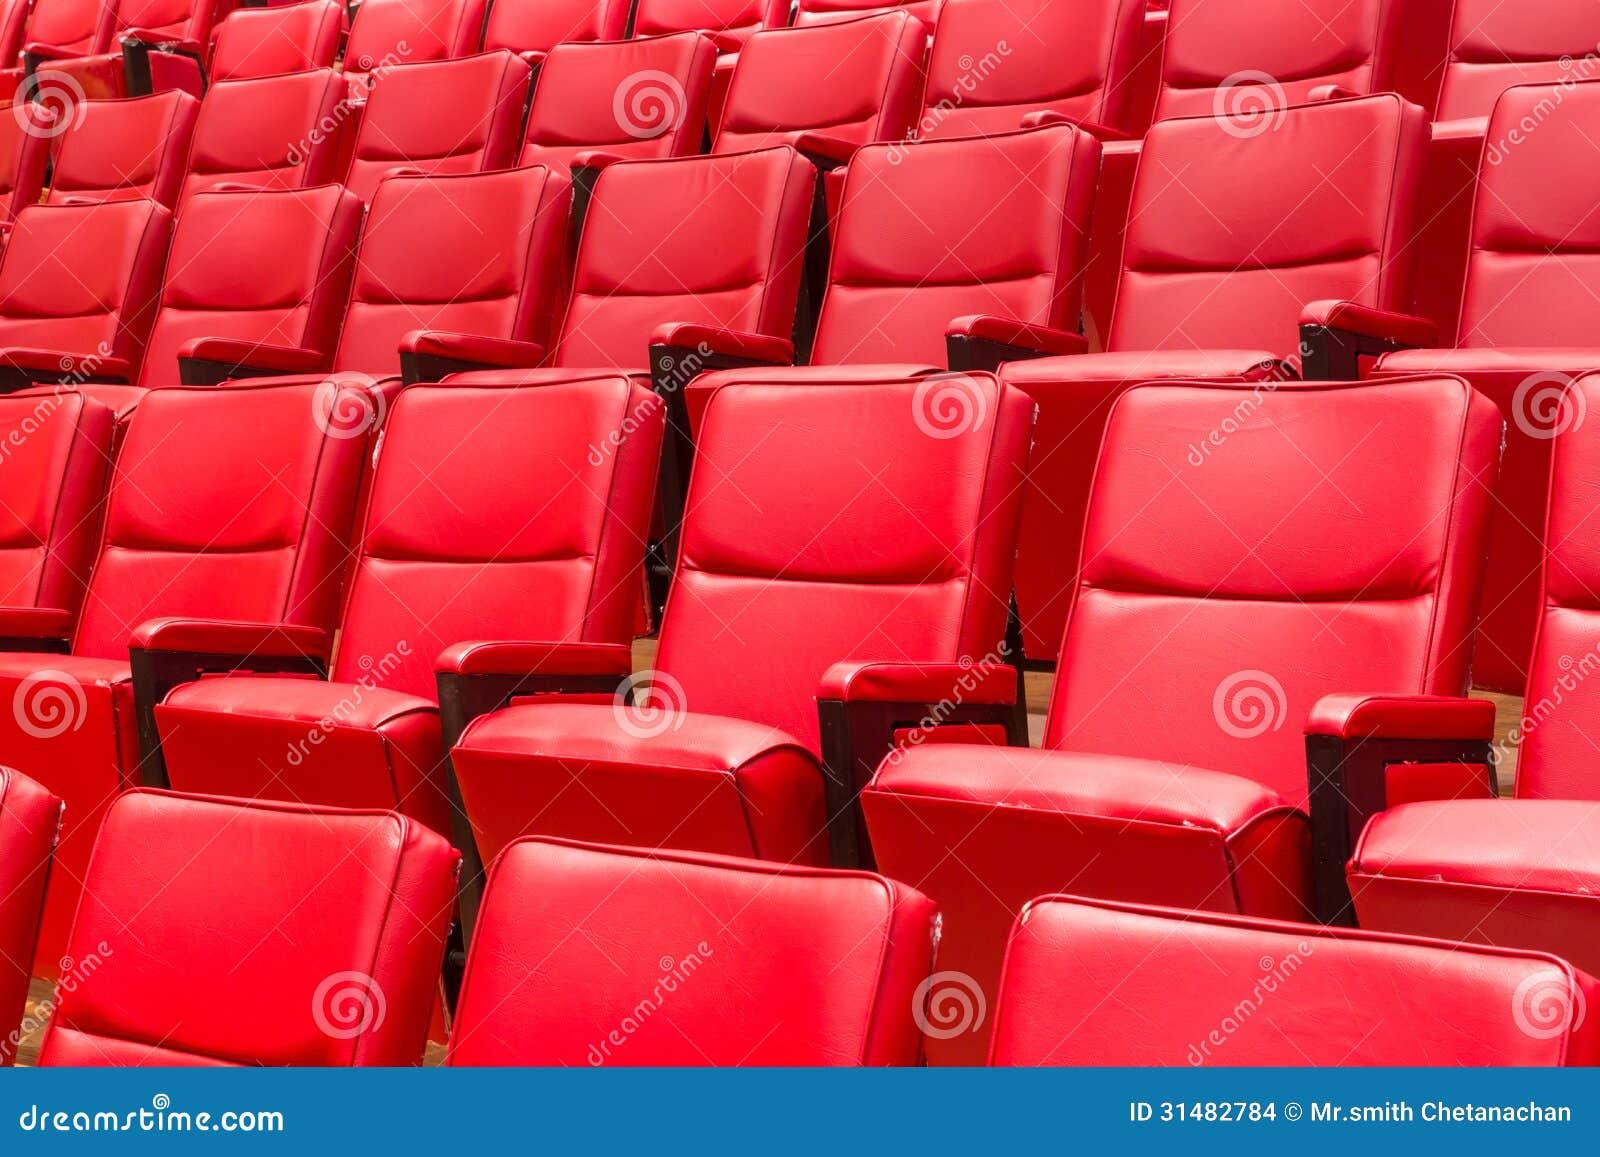 Theatre Chair Stock Image Cartoondealer Com 1288783